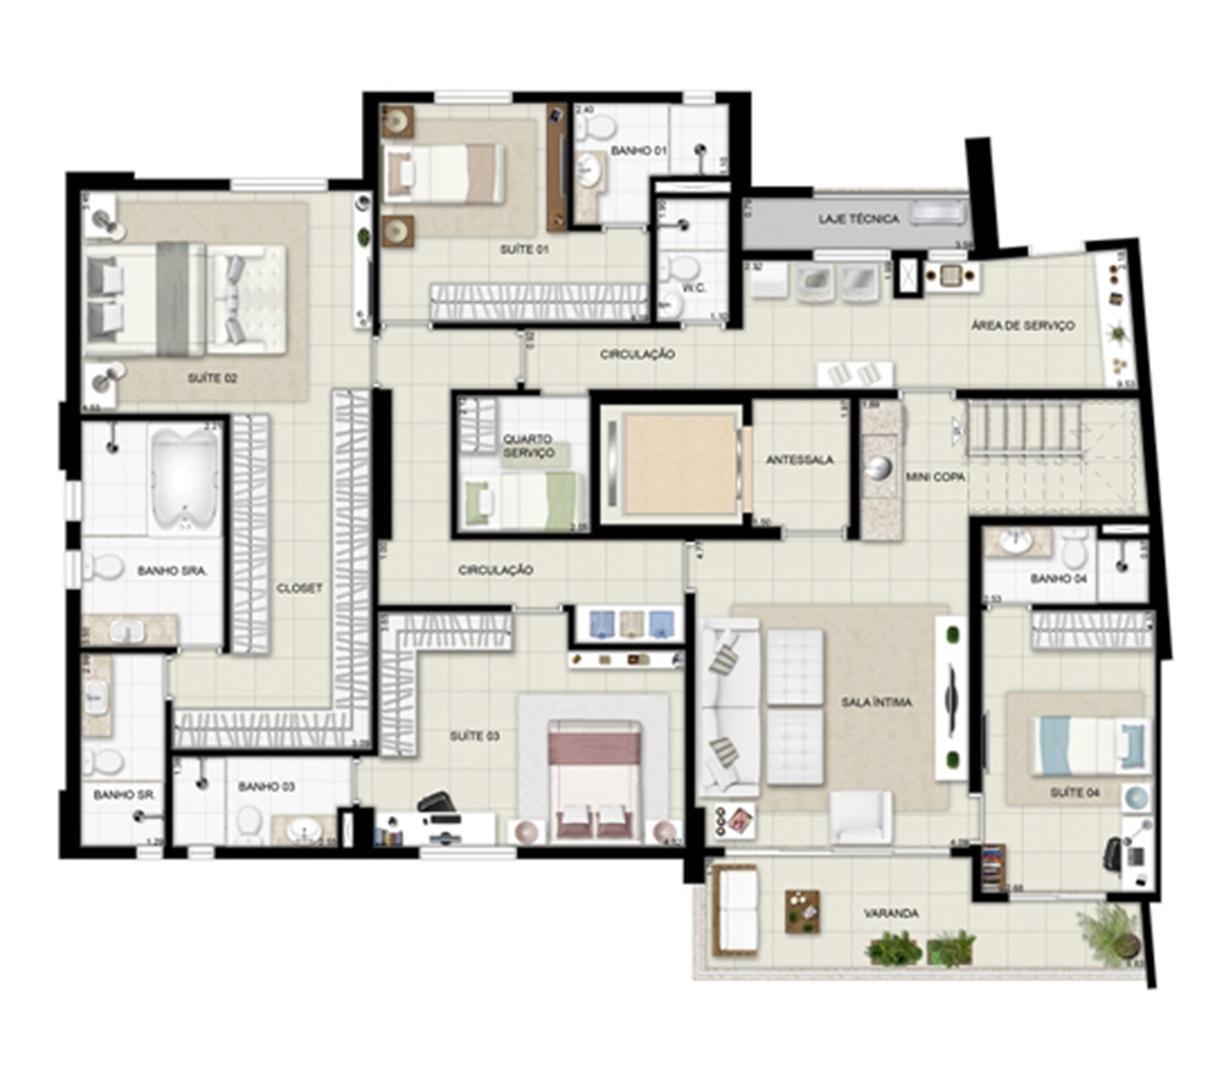 Planta duplex inferior - Torre Boulevard - Final 01 390 m² | Chateau Marista LifeStyle – Apartamento no  Setor Marista - Goiânia - Goiás